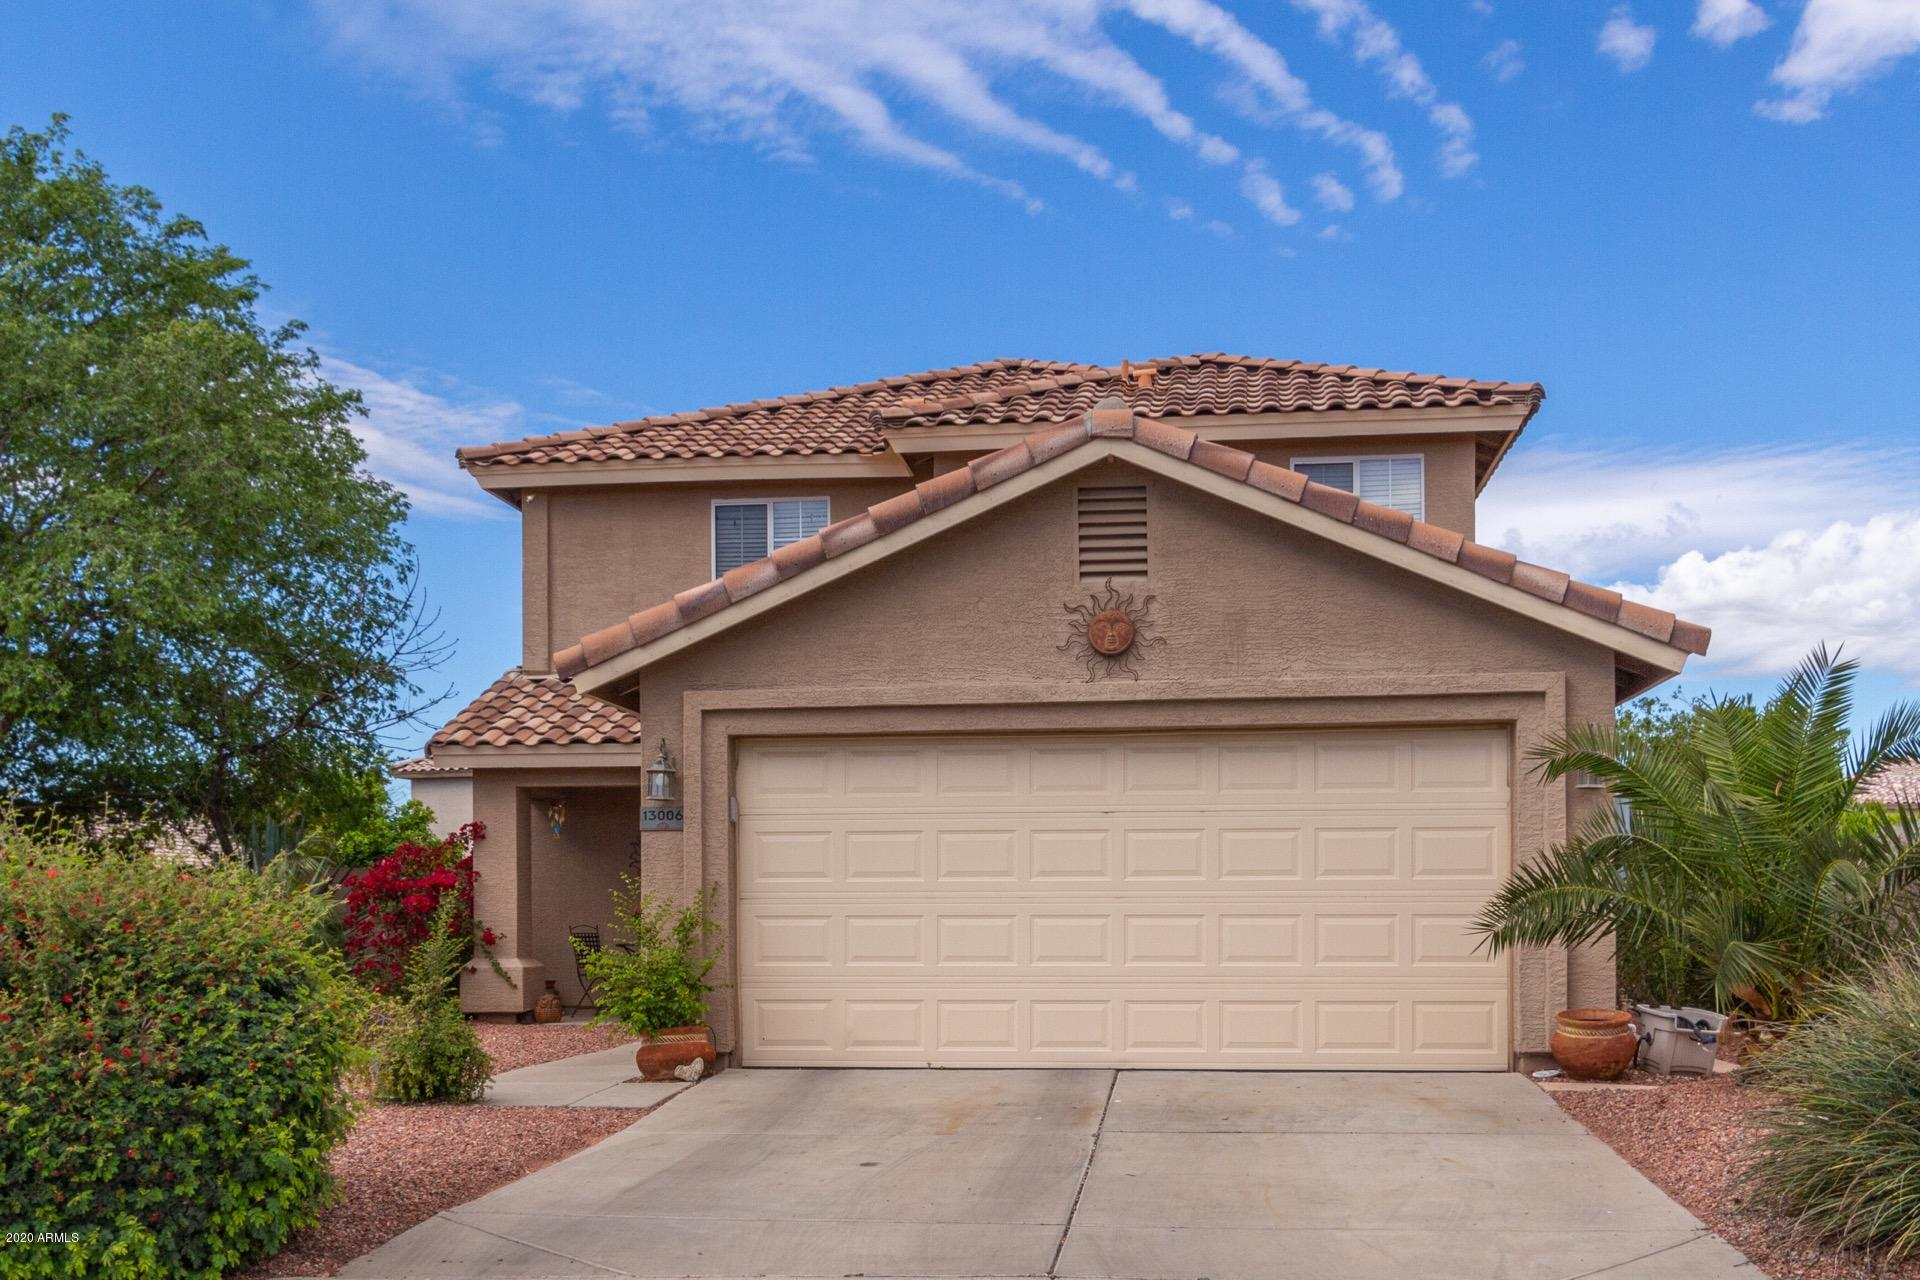 Photo of 13006 N POPPY Street, El Mirage, AZ 85335